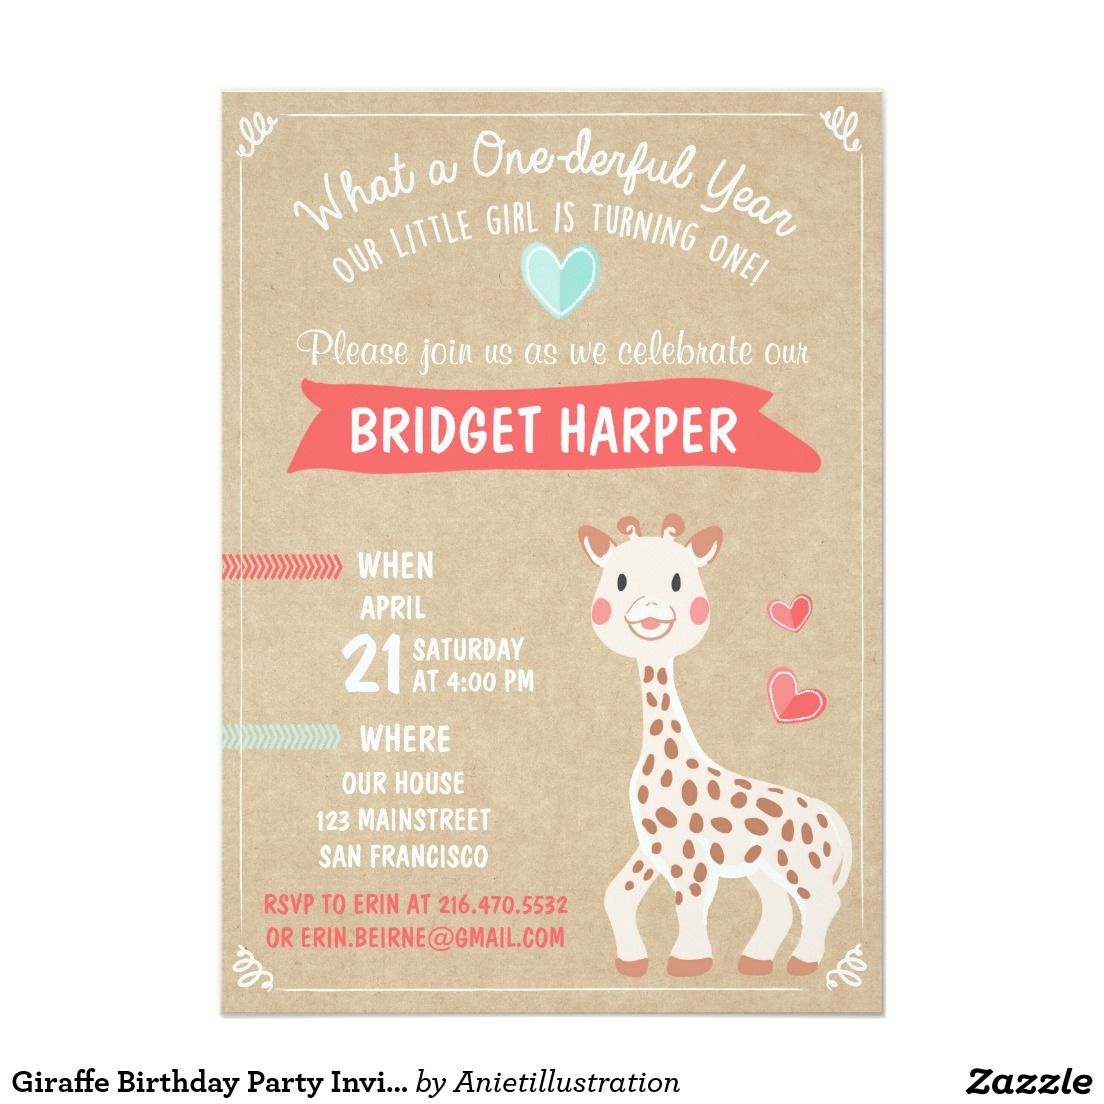 Giraffe Birthday Party Invitation First Birthday | Sophie the ...